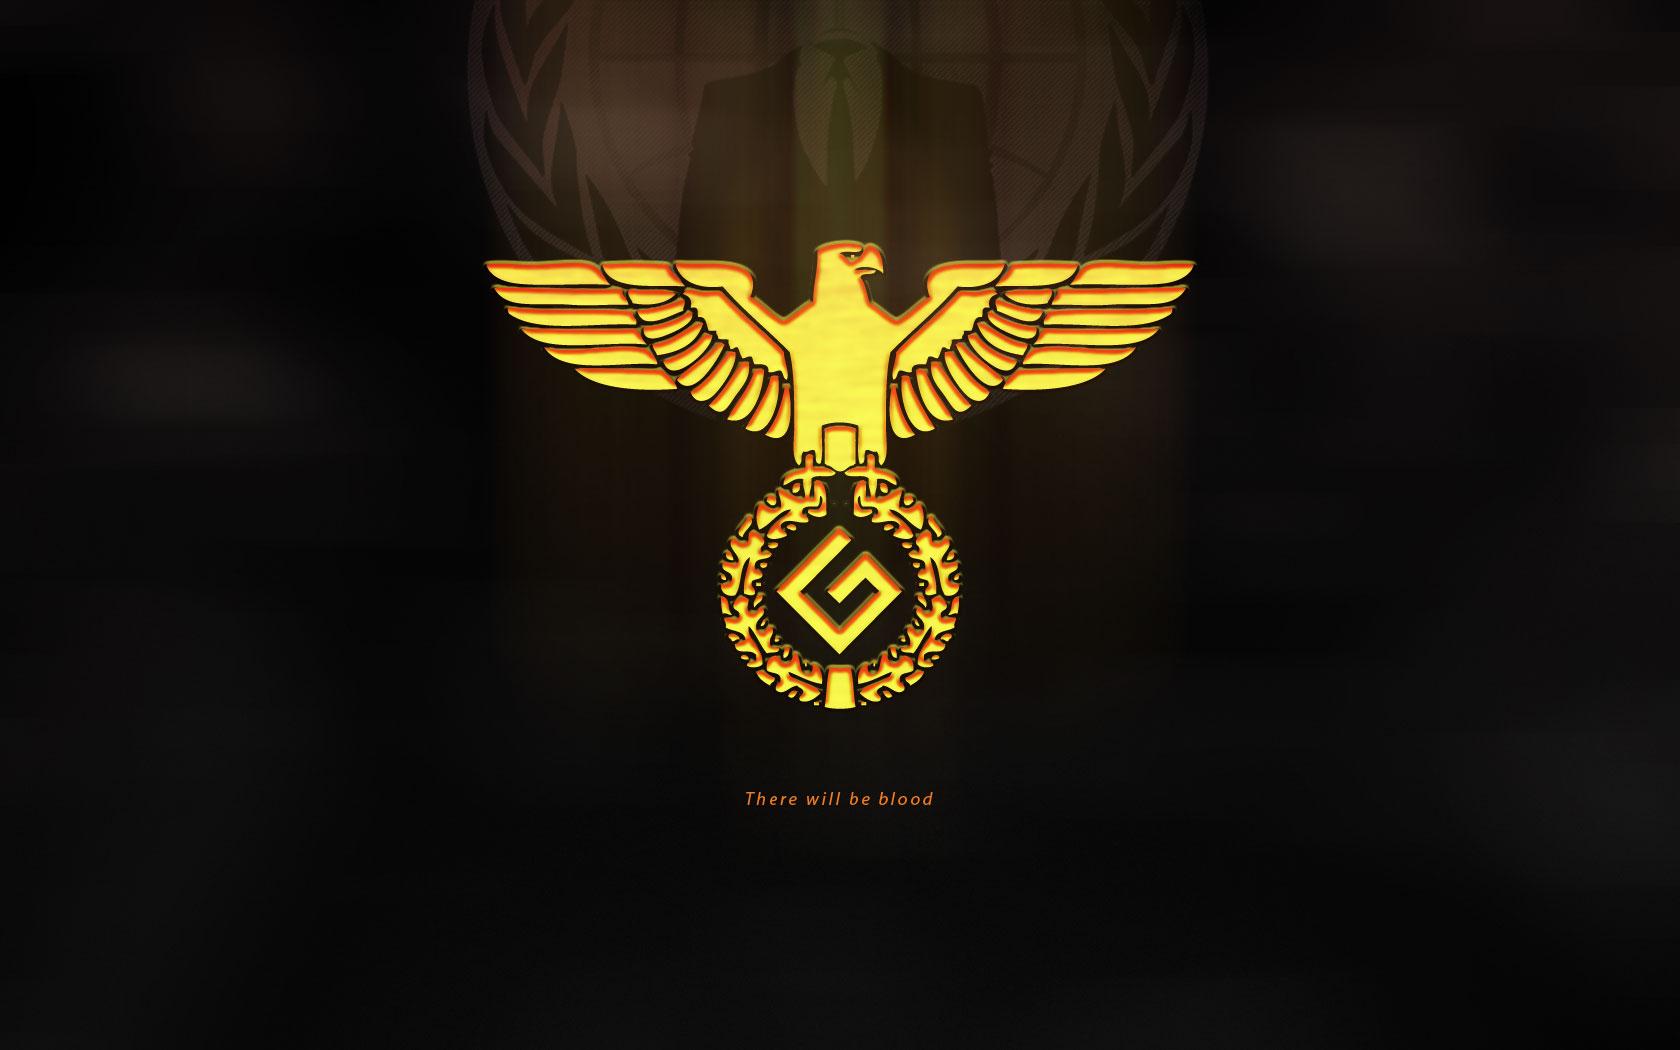 Ufo Gestapo - Grandemissair